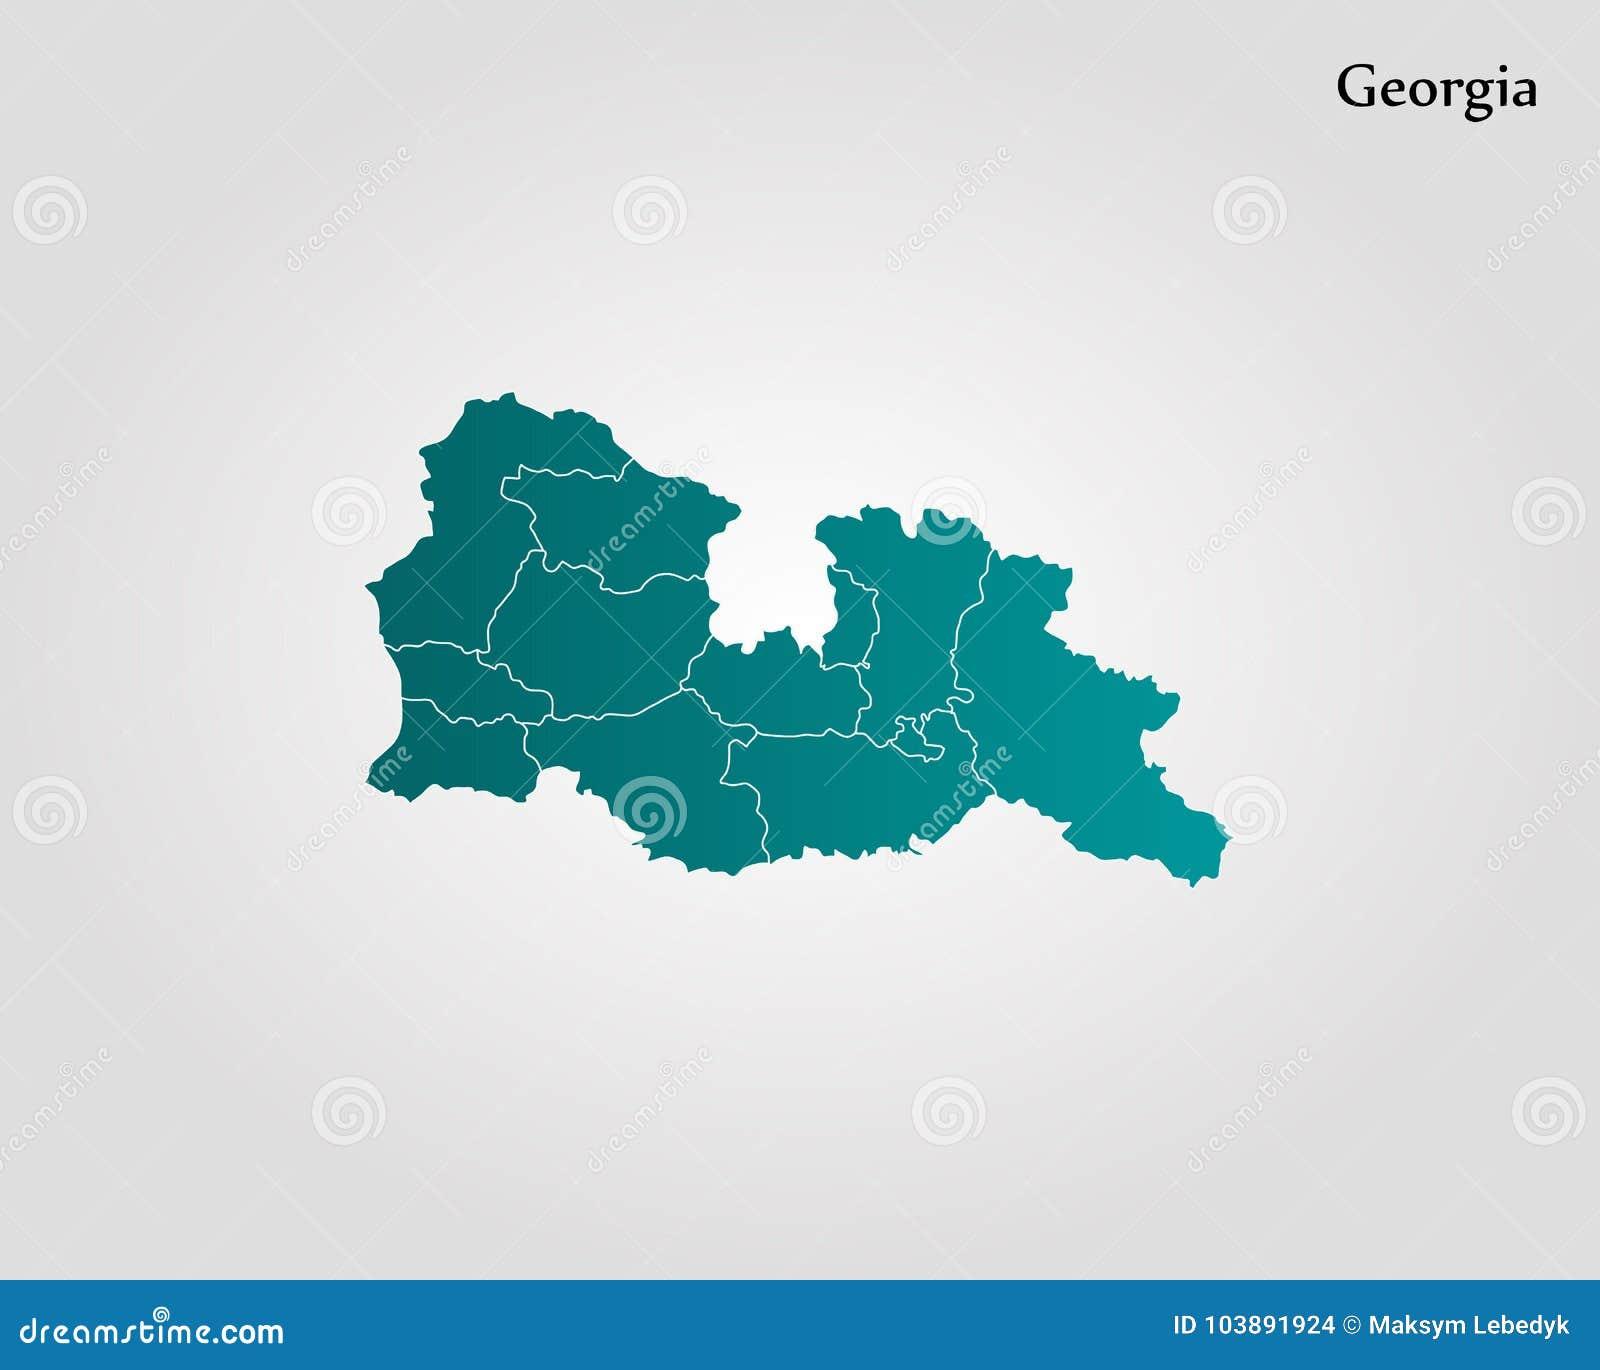 World Map Of Georgia.Map Of Georgia Stock Illustration Illustration Of Icon 103891924